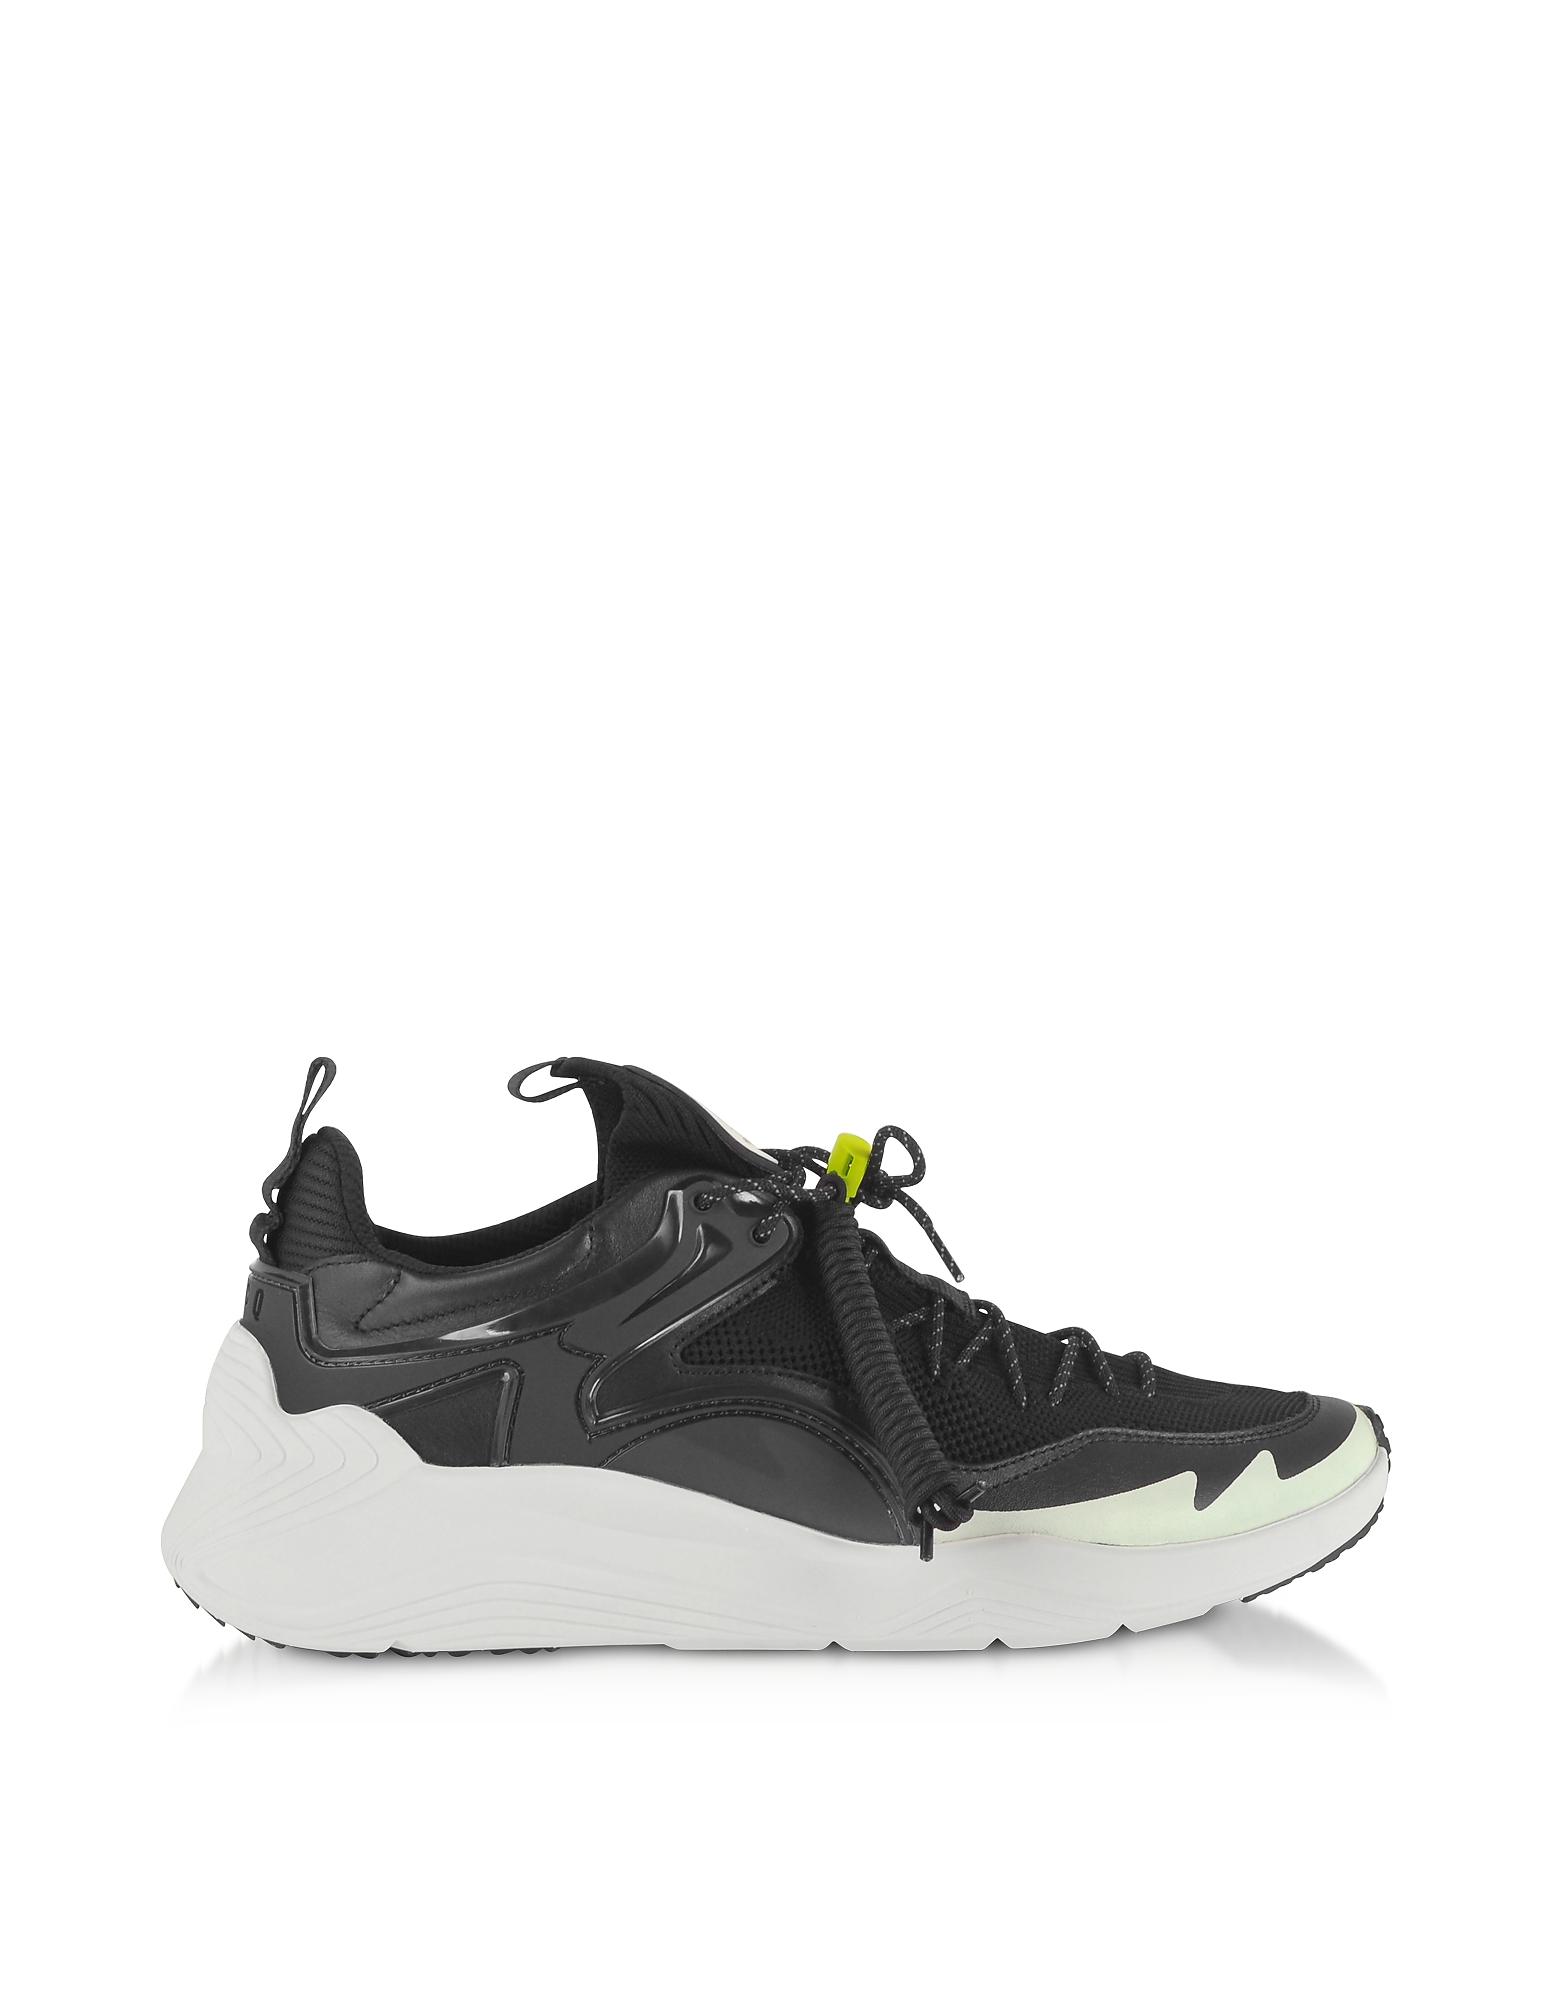 McQ Alexander McQueen Designer Shoes, Ghishiki 2.0 Black Fabric Men's Sneakers